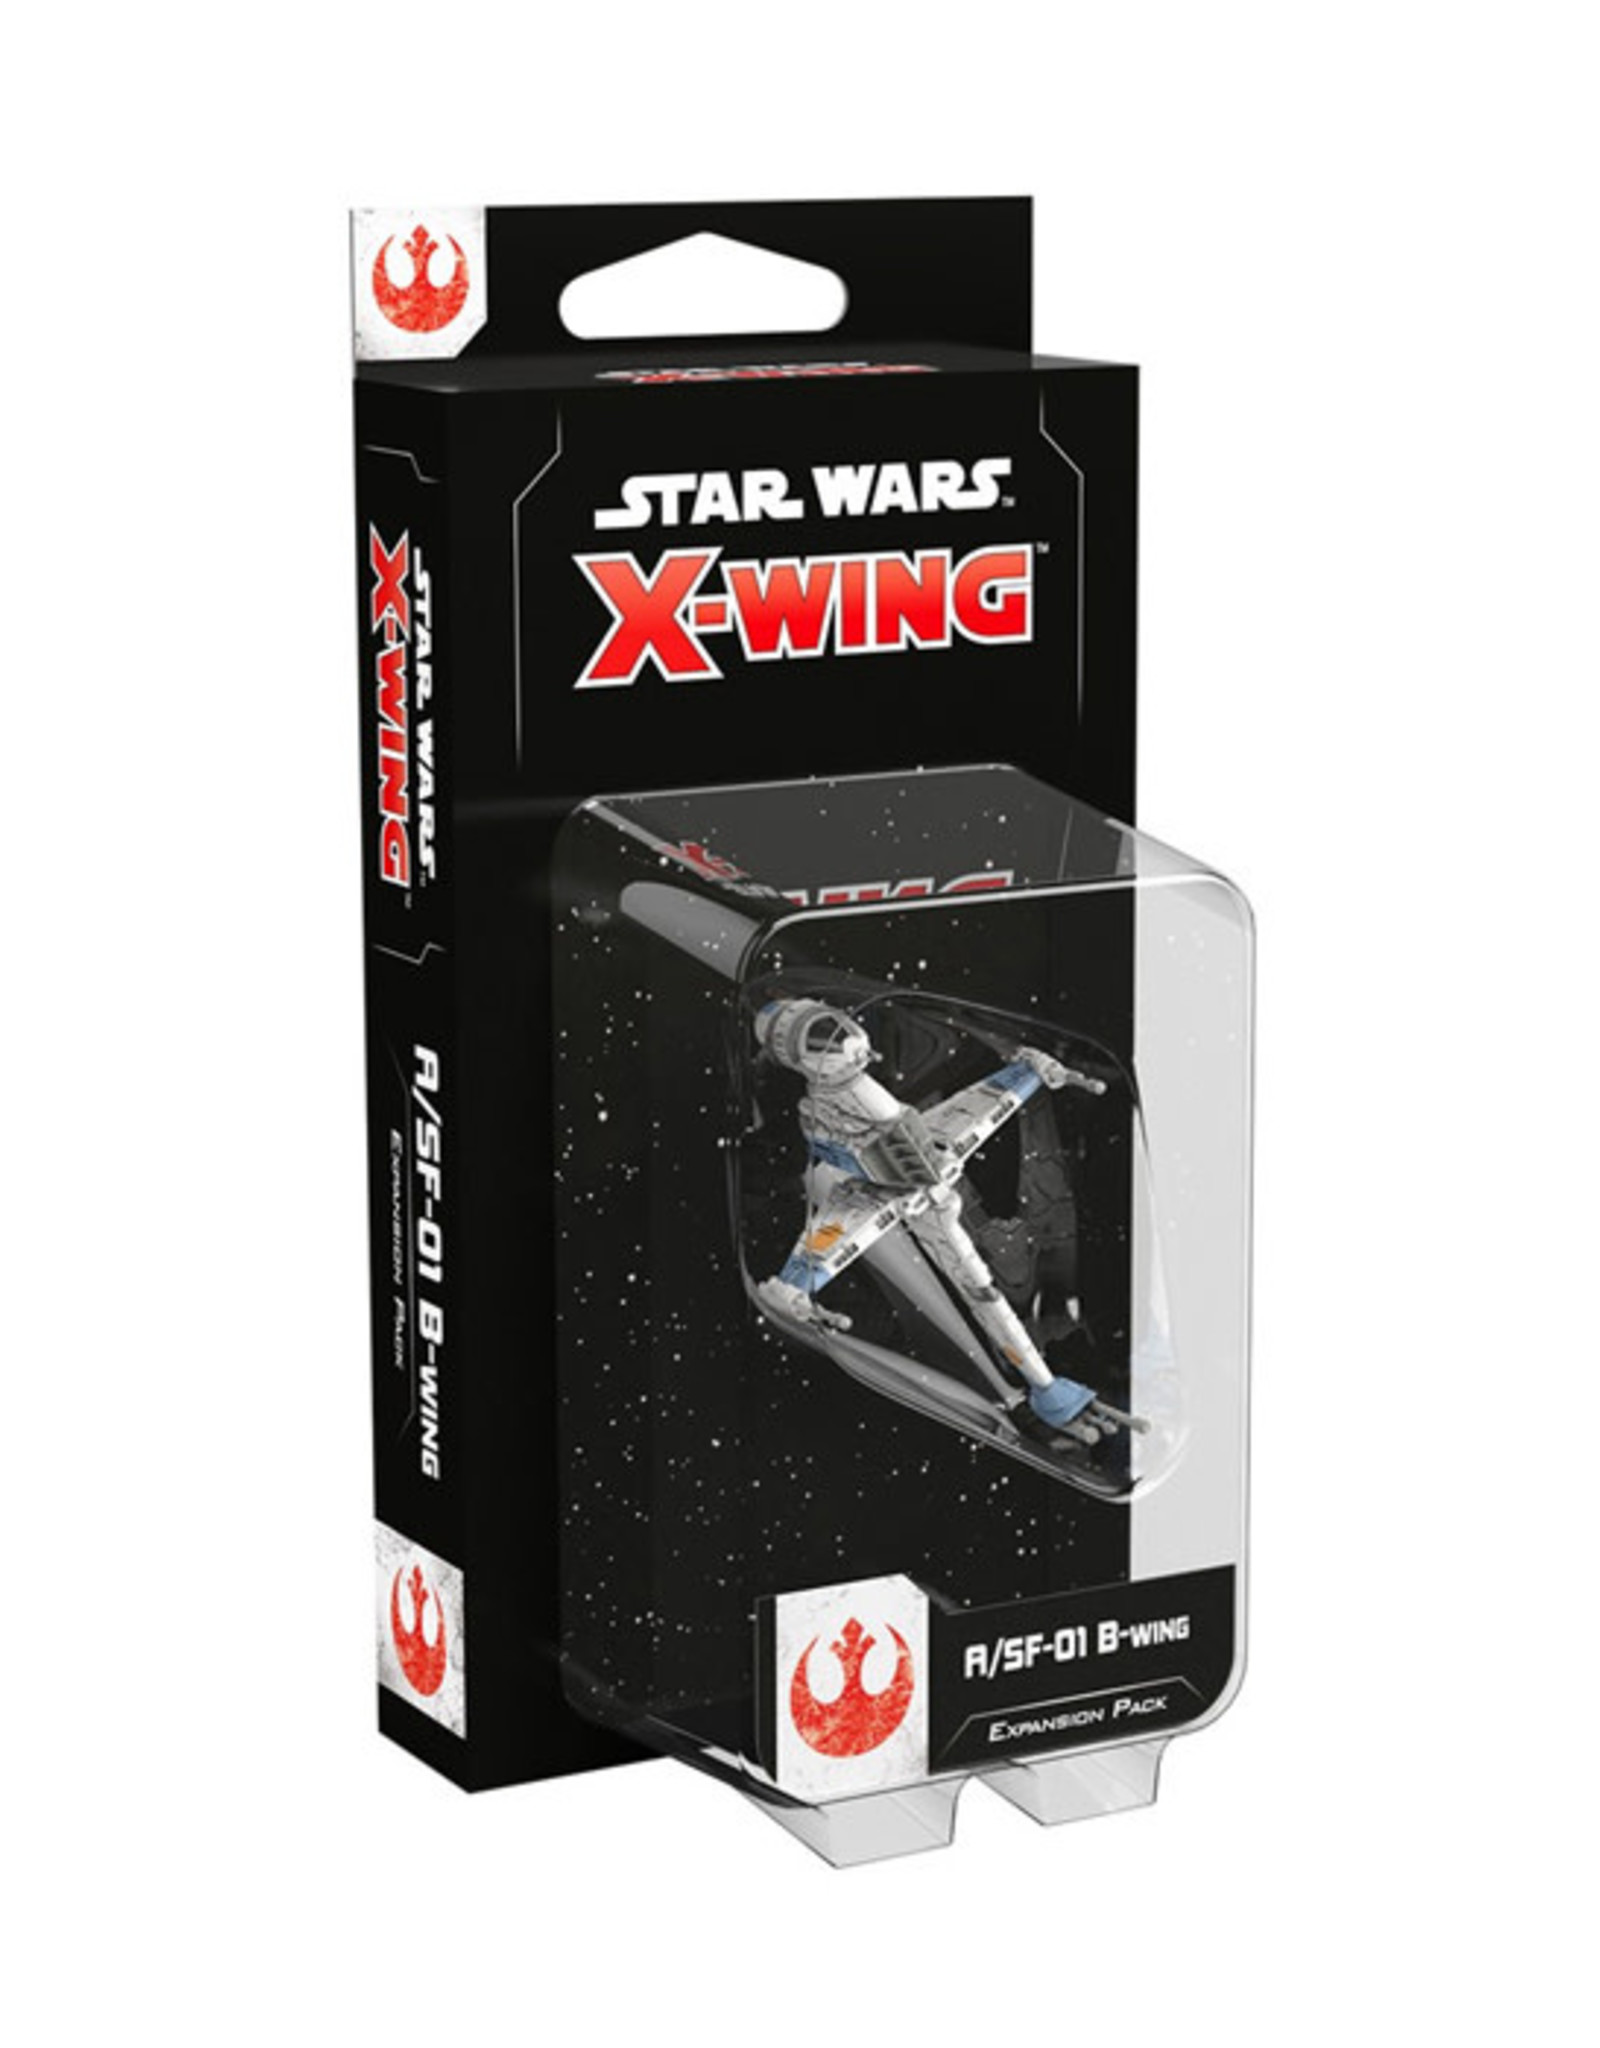 Fantasy Flight Games Star Wars: X-Wing - 2nd Edition - A/SF-01 B-Wing